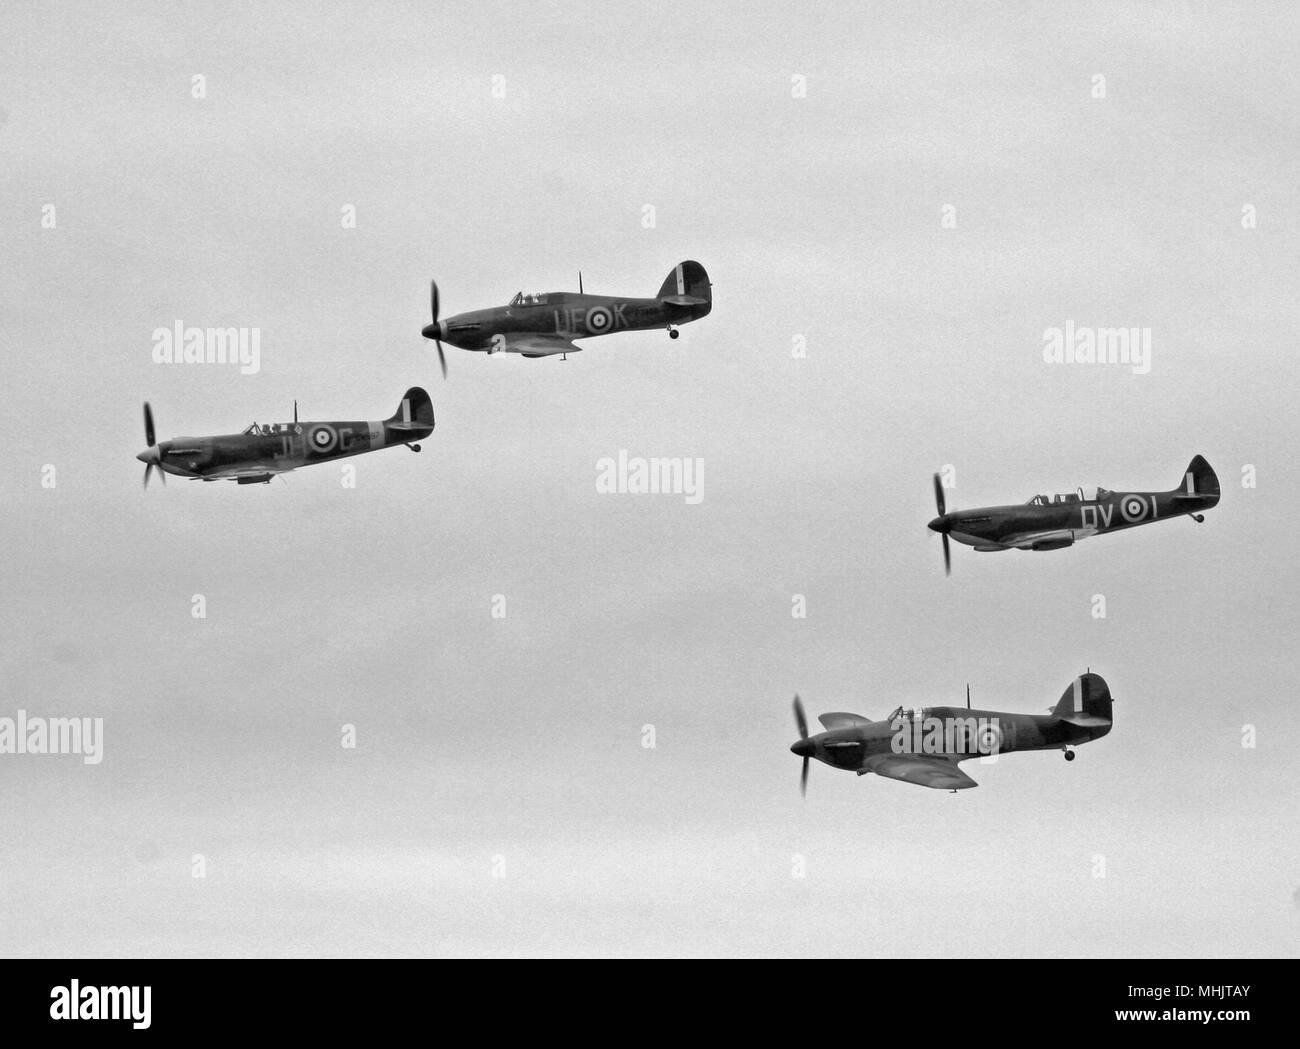 Shoreham Airshow 2013 Photo Stock